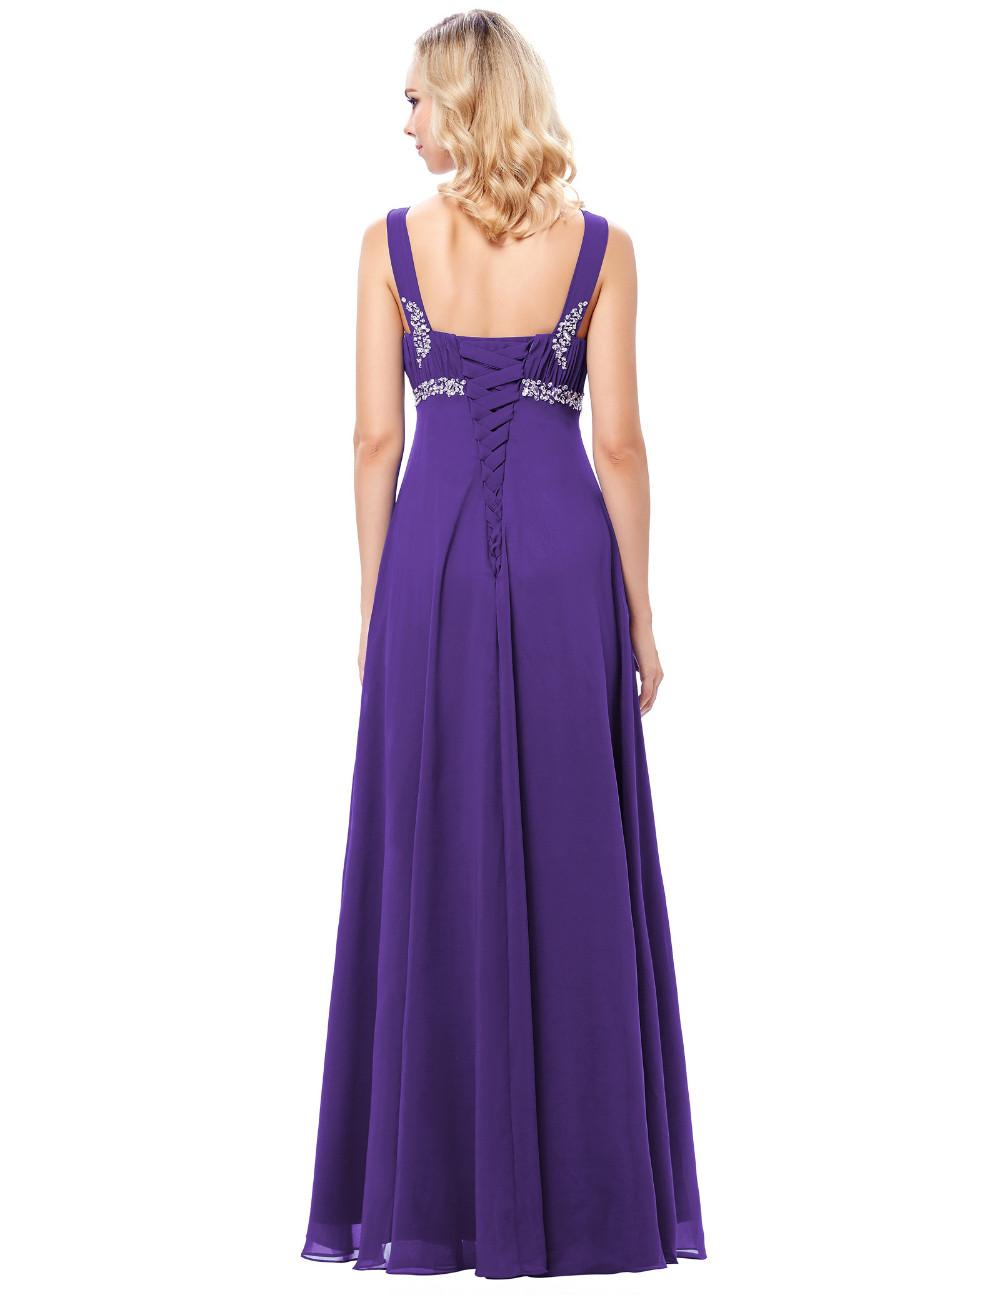 HTB1D_YNOFXXXXa5aFXXq6xXFXXX3Long Formal Dress Elegant Floor Length Chiffon Dress